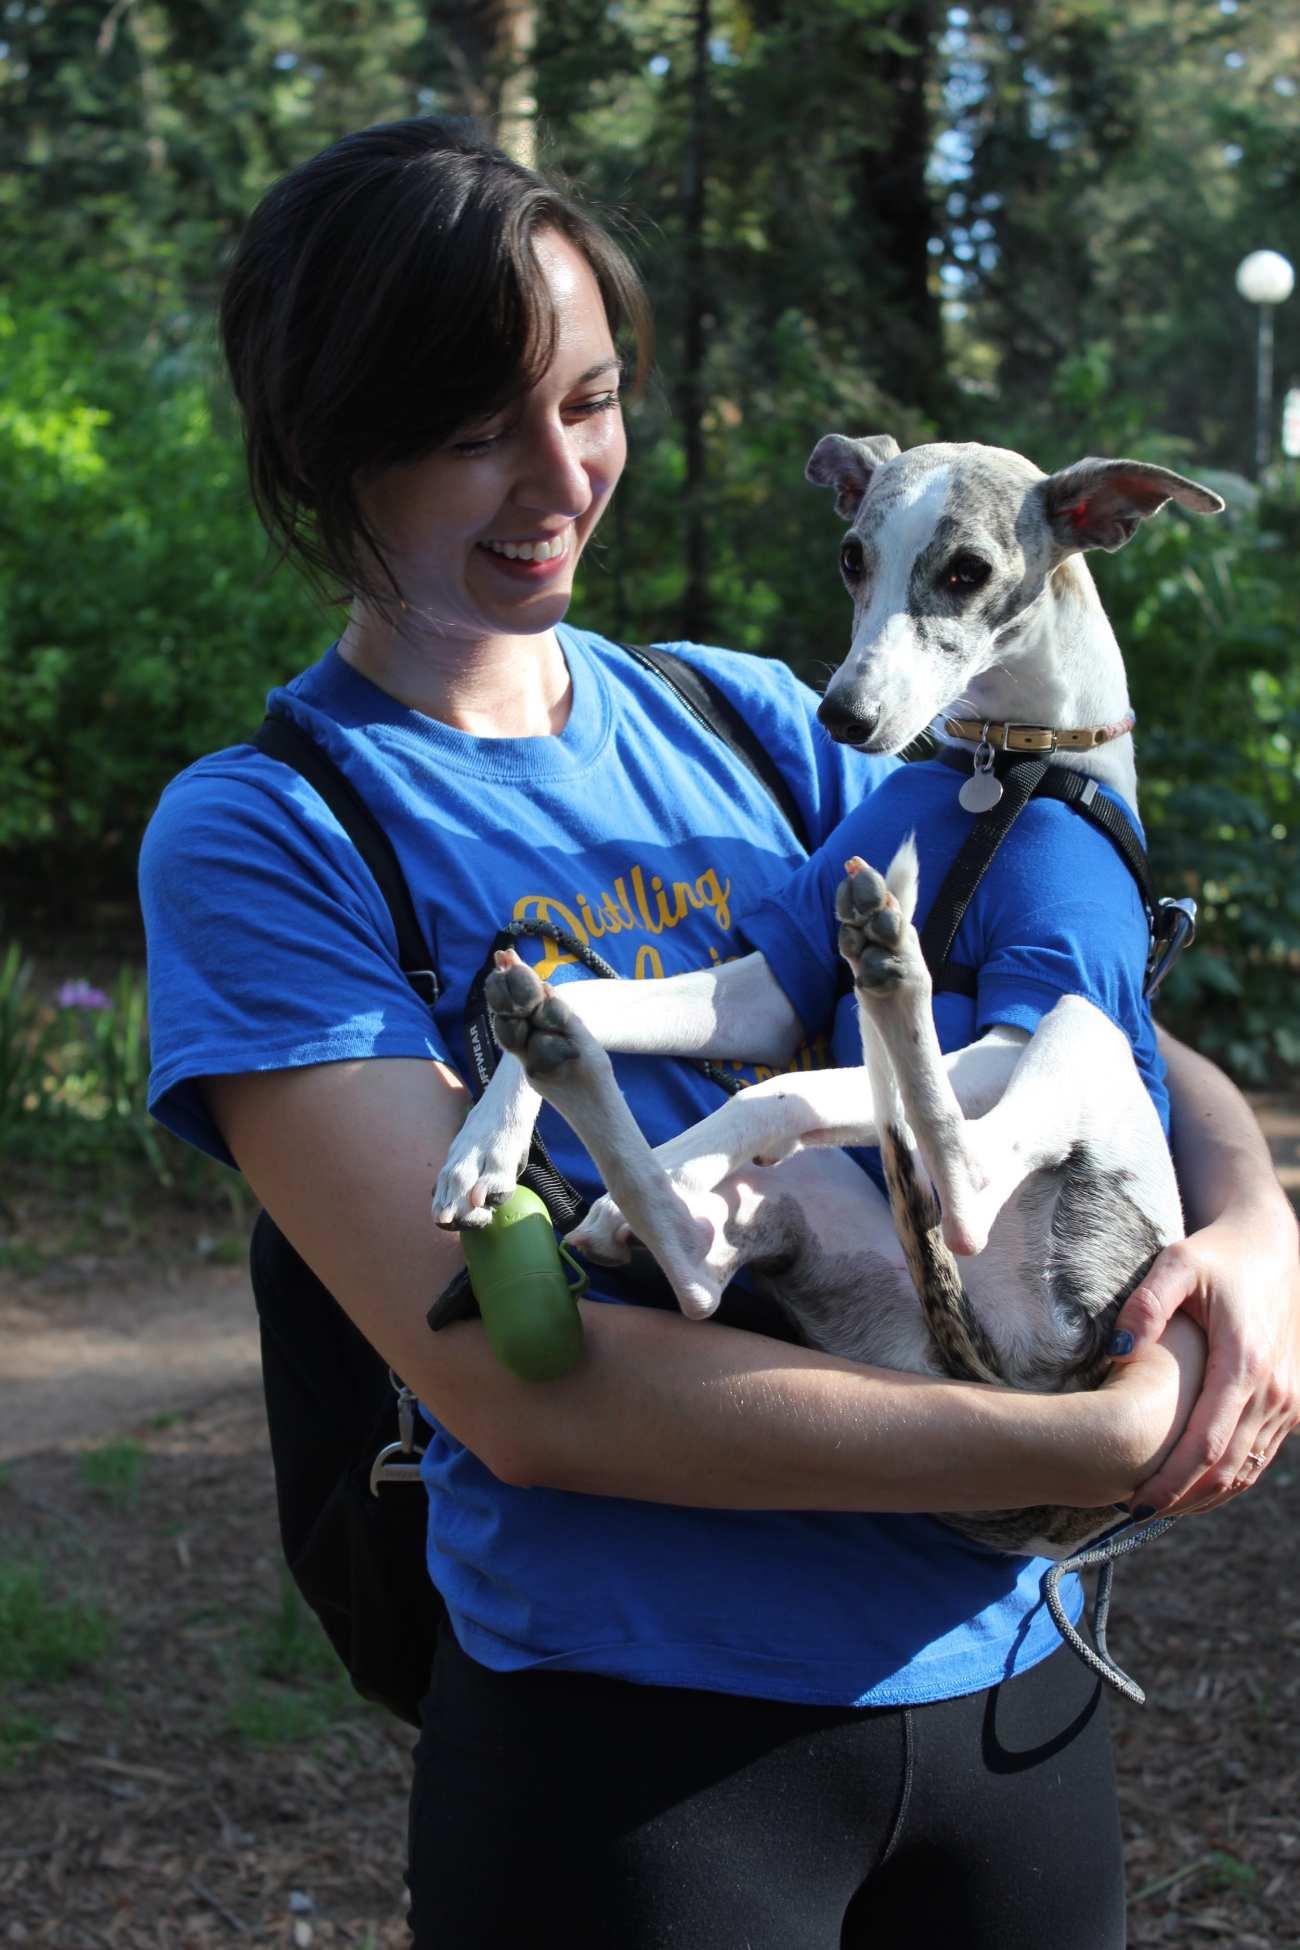 picnic day whippet dog 1-min